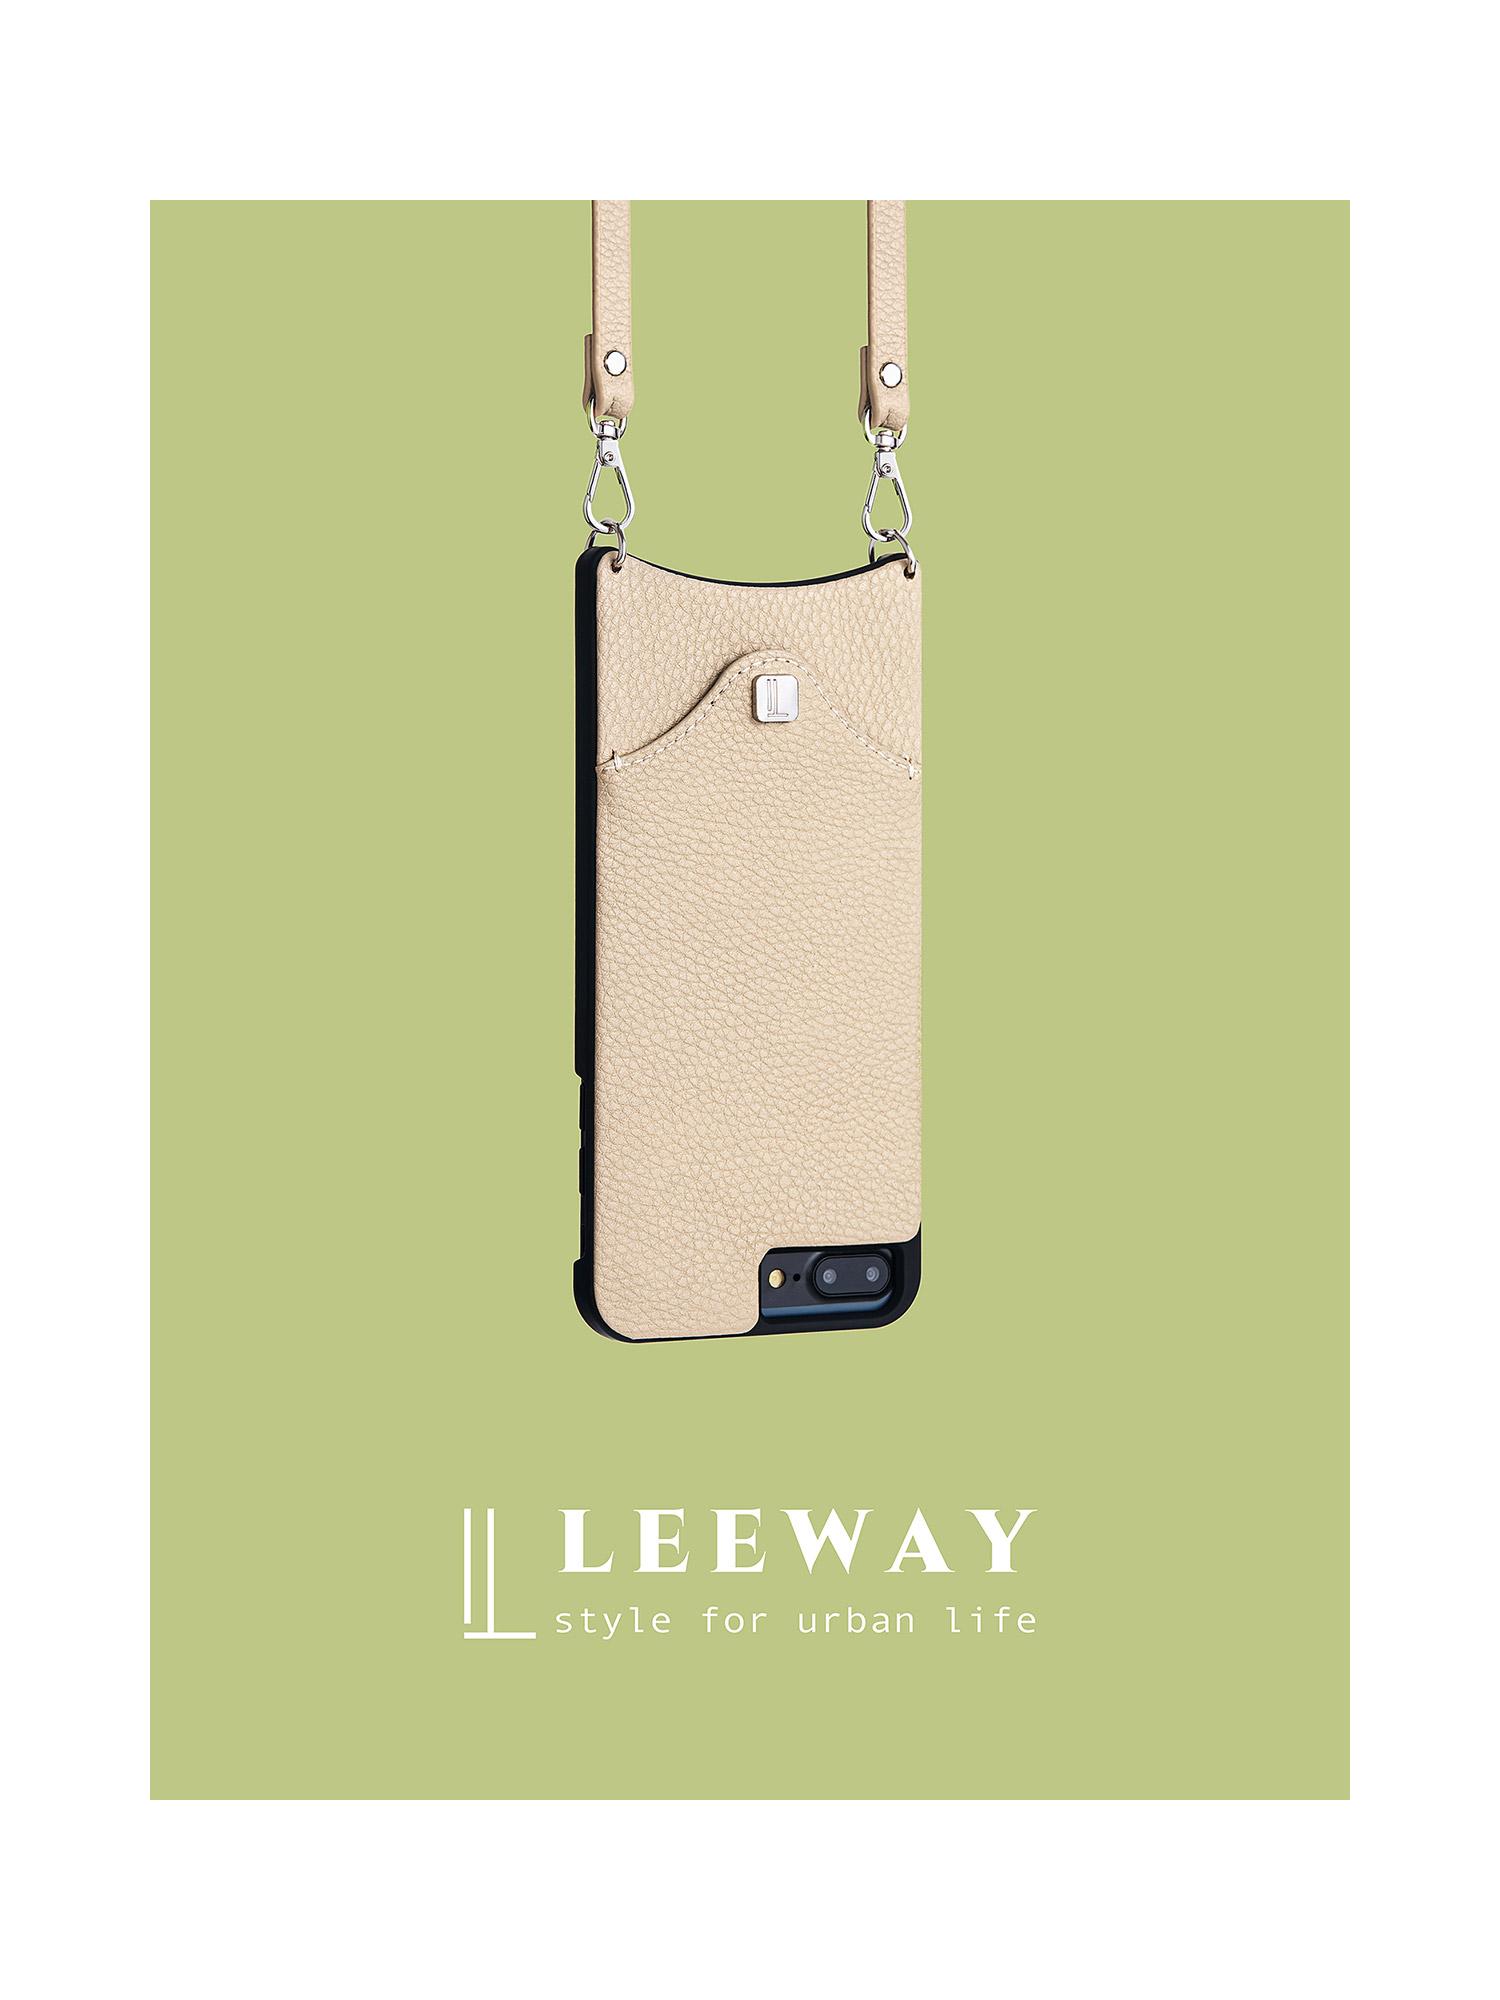 LEEWAY - Portfolio - Commercial | Alexander Sakulin - Professional Photographer